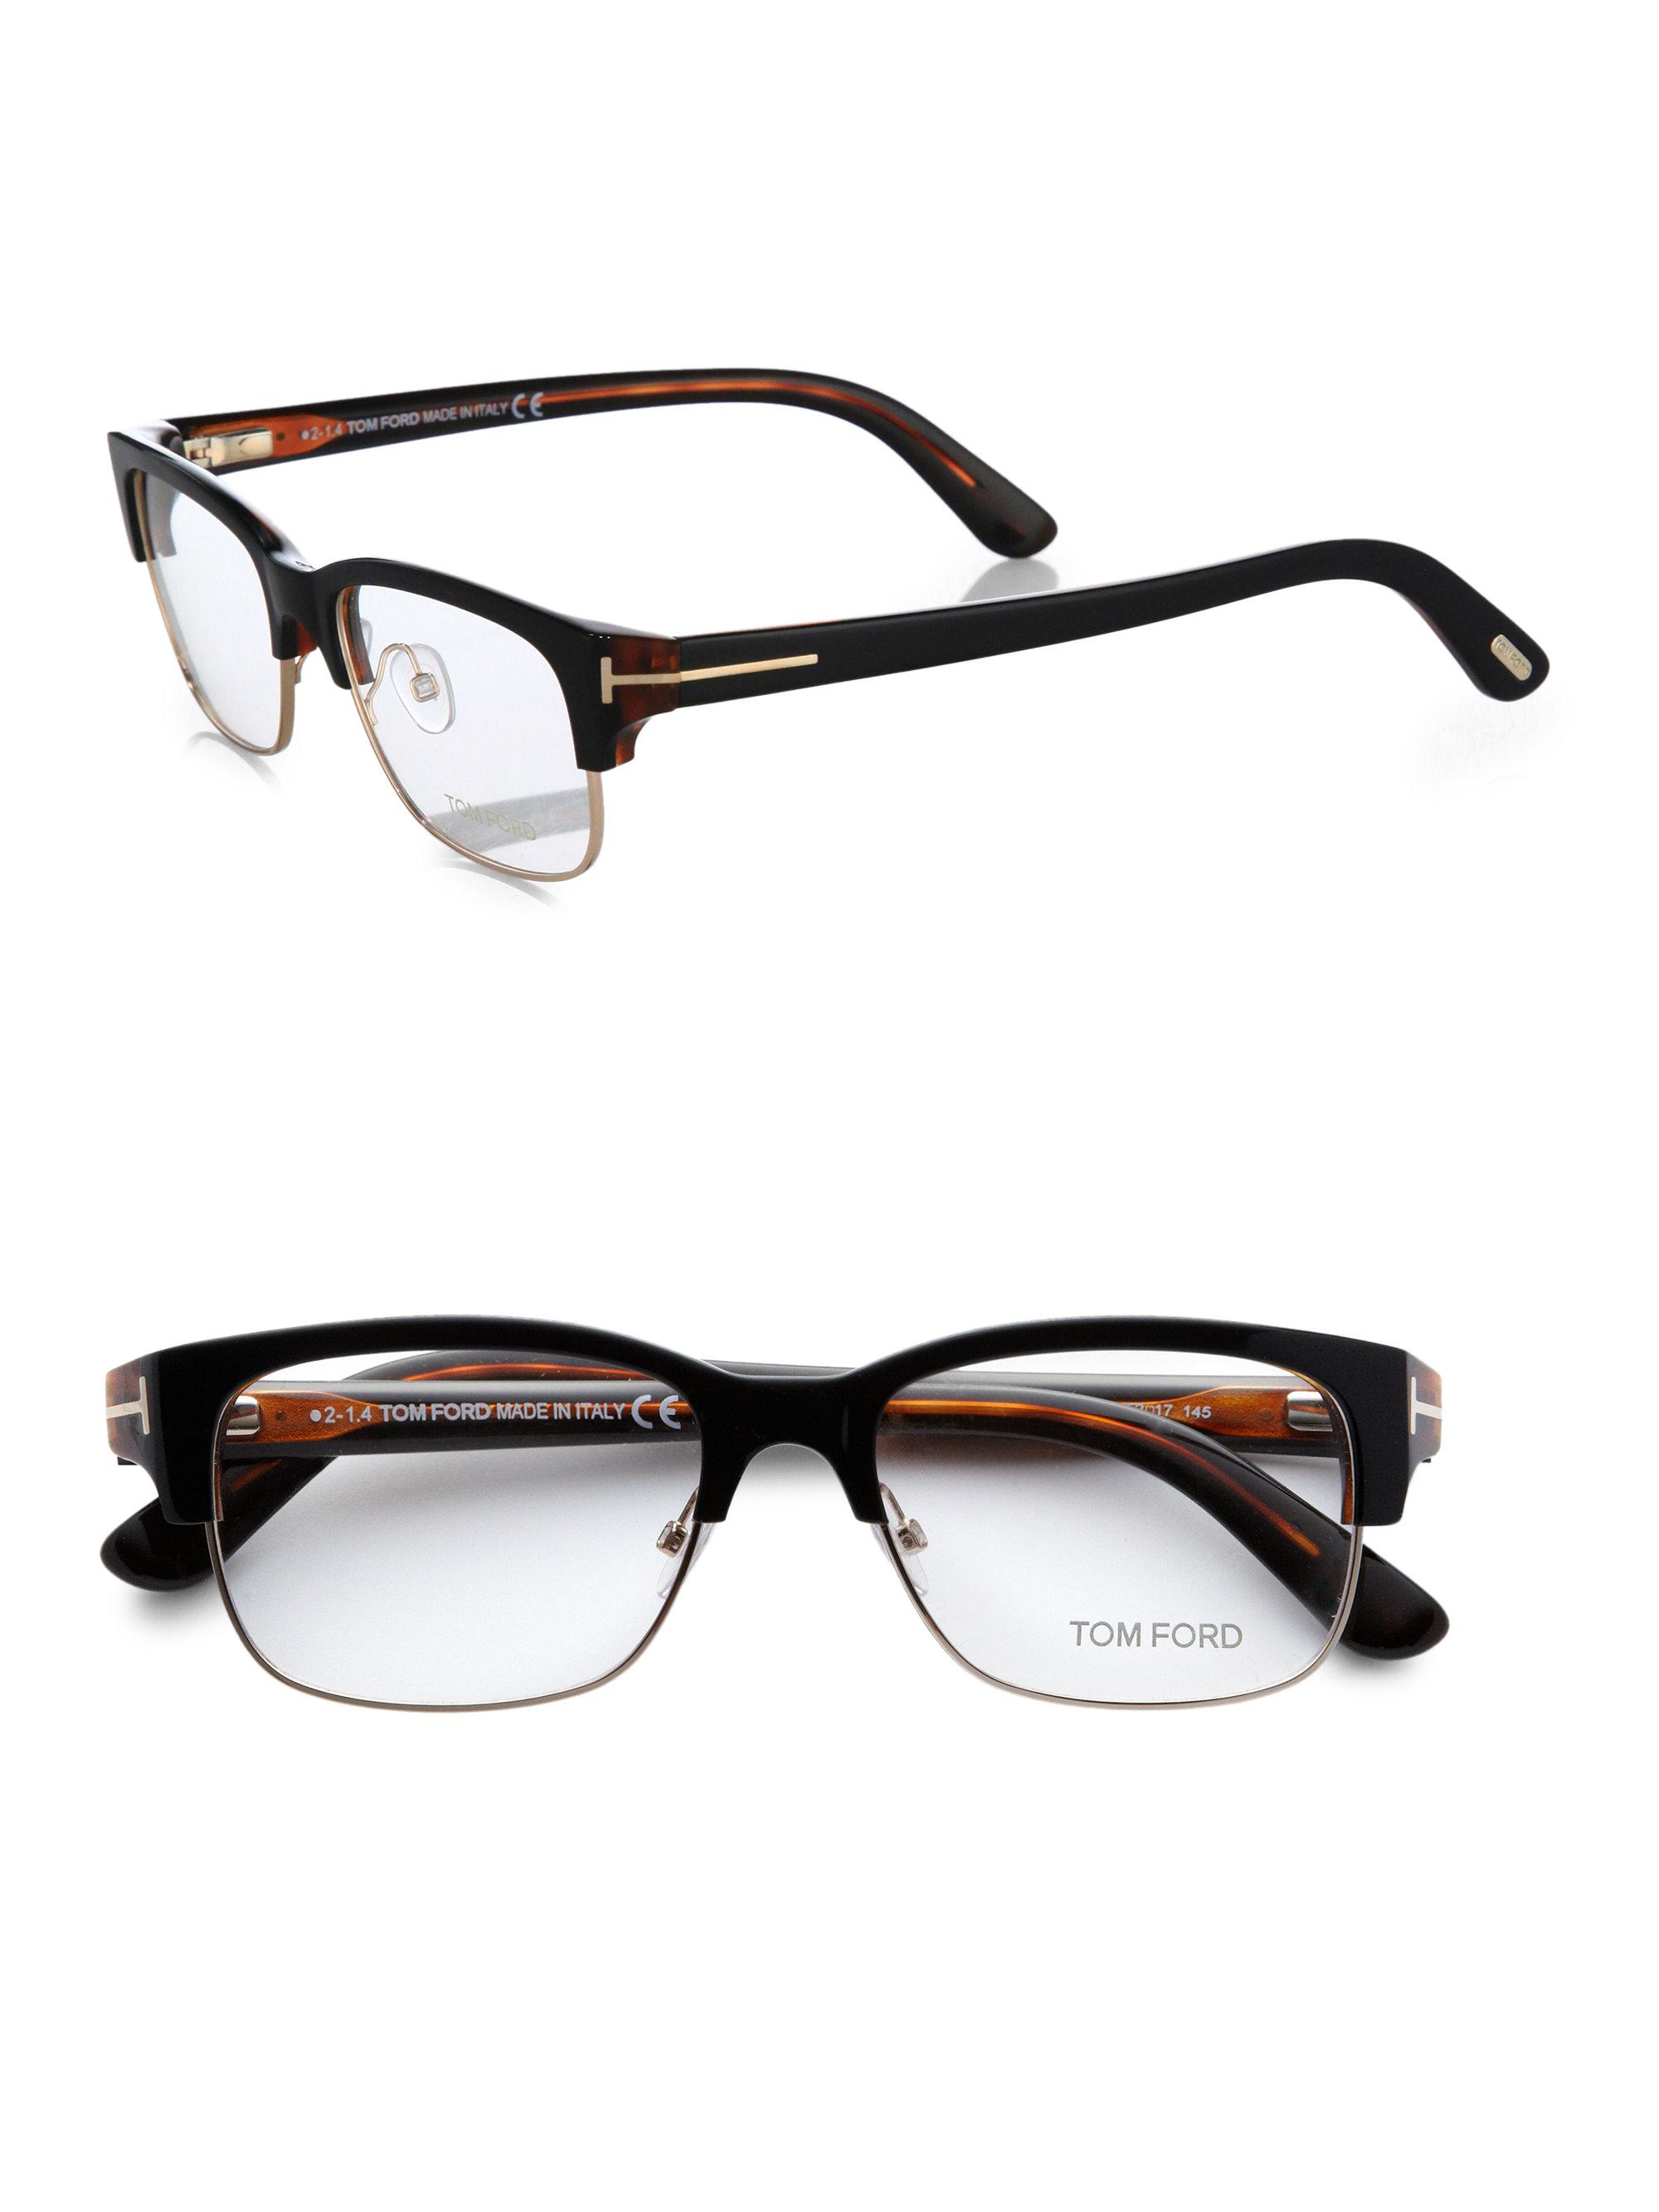 p eyeglasses ford horn women oval tom womens phjqzgd color burgundy sunglasses c s ft